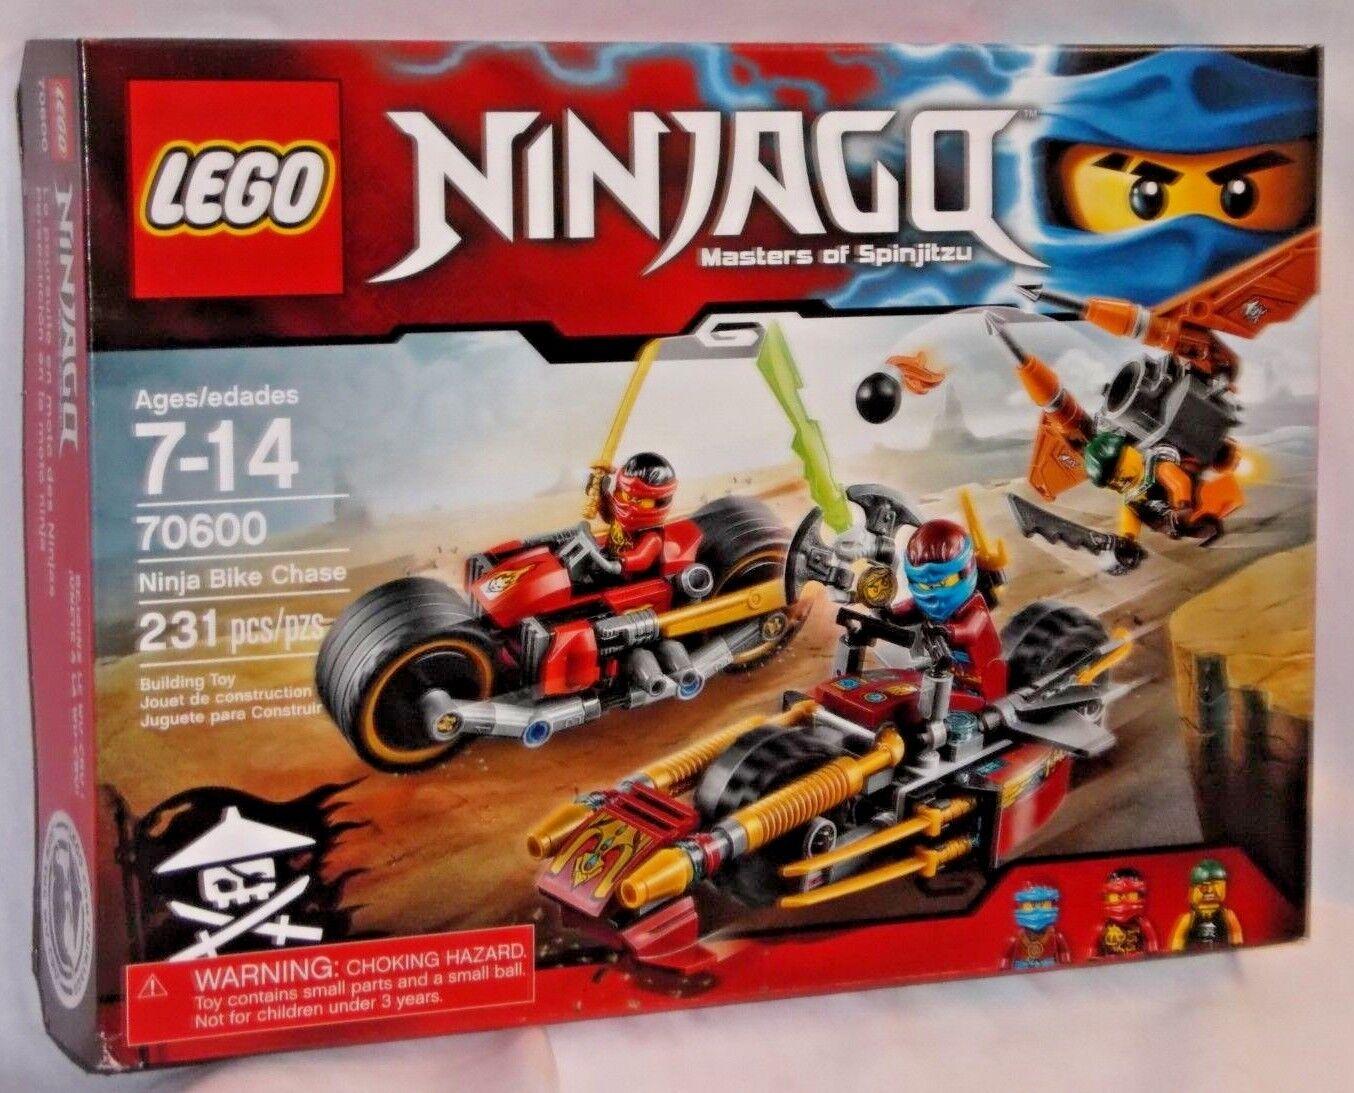 NEW SEALED 70600 LEGO Ninjago NINJA BIKE CHASE Motorcycle Vehicle 231 pc RETIrosso